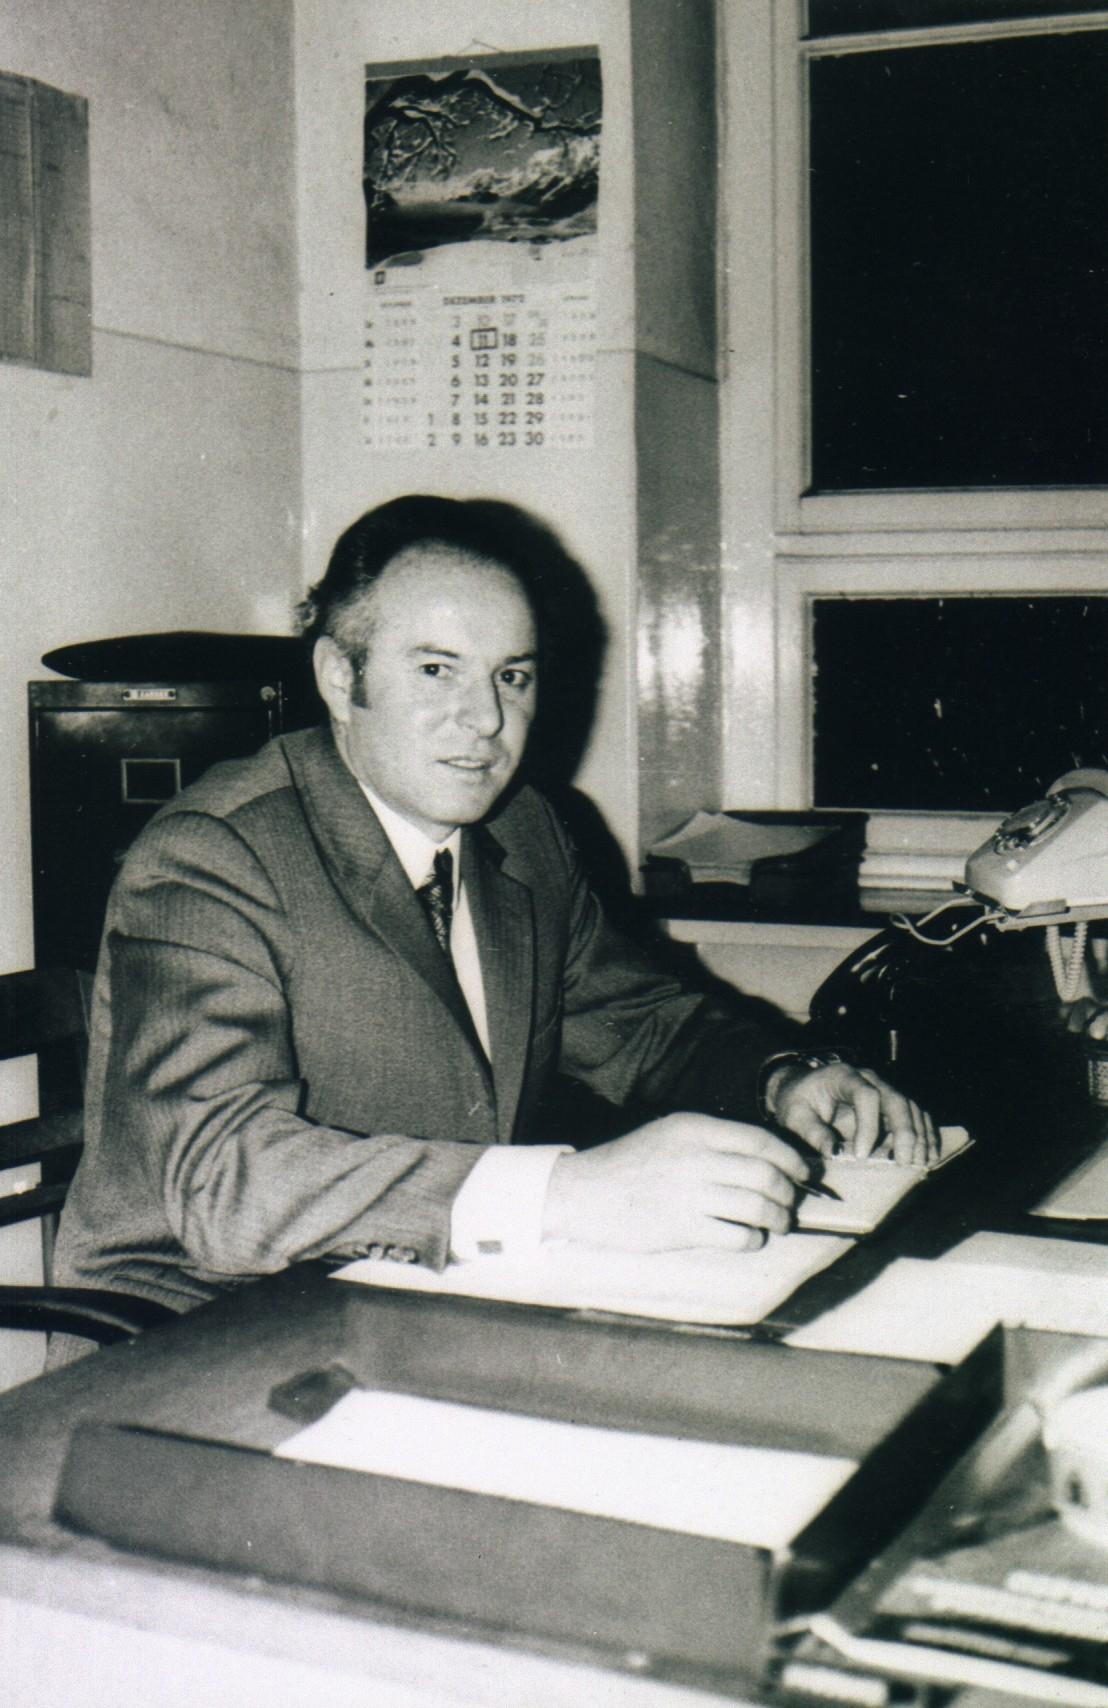 Elektro-Obersteiger Johannes Baumert